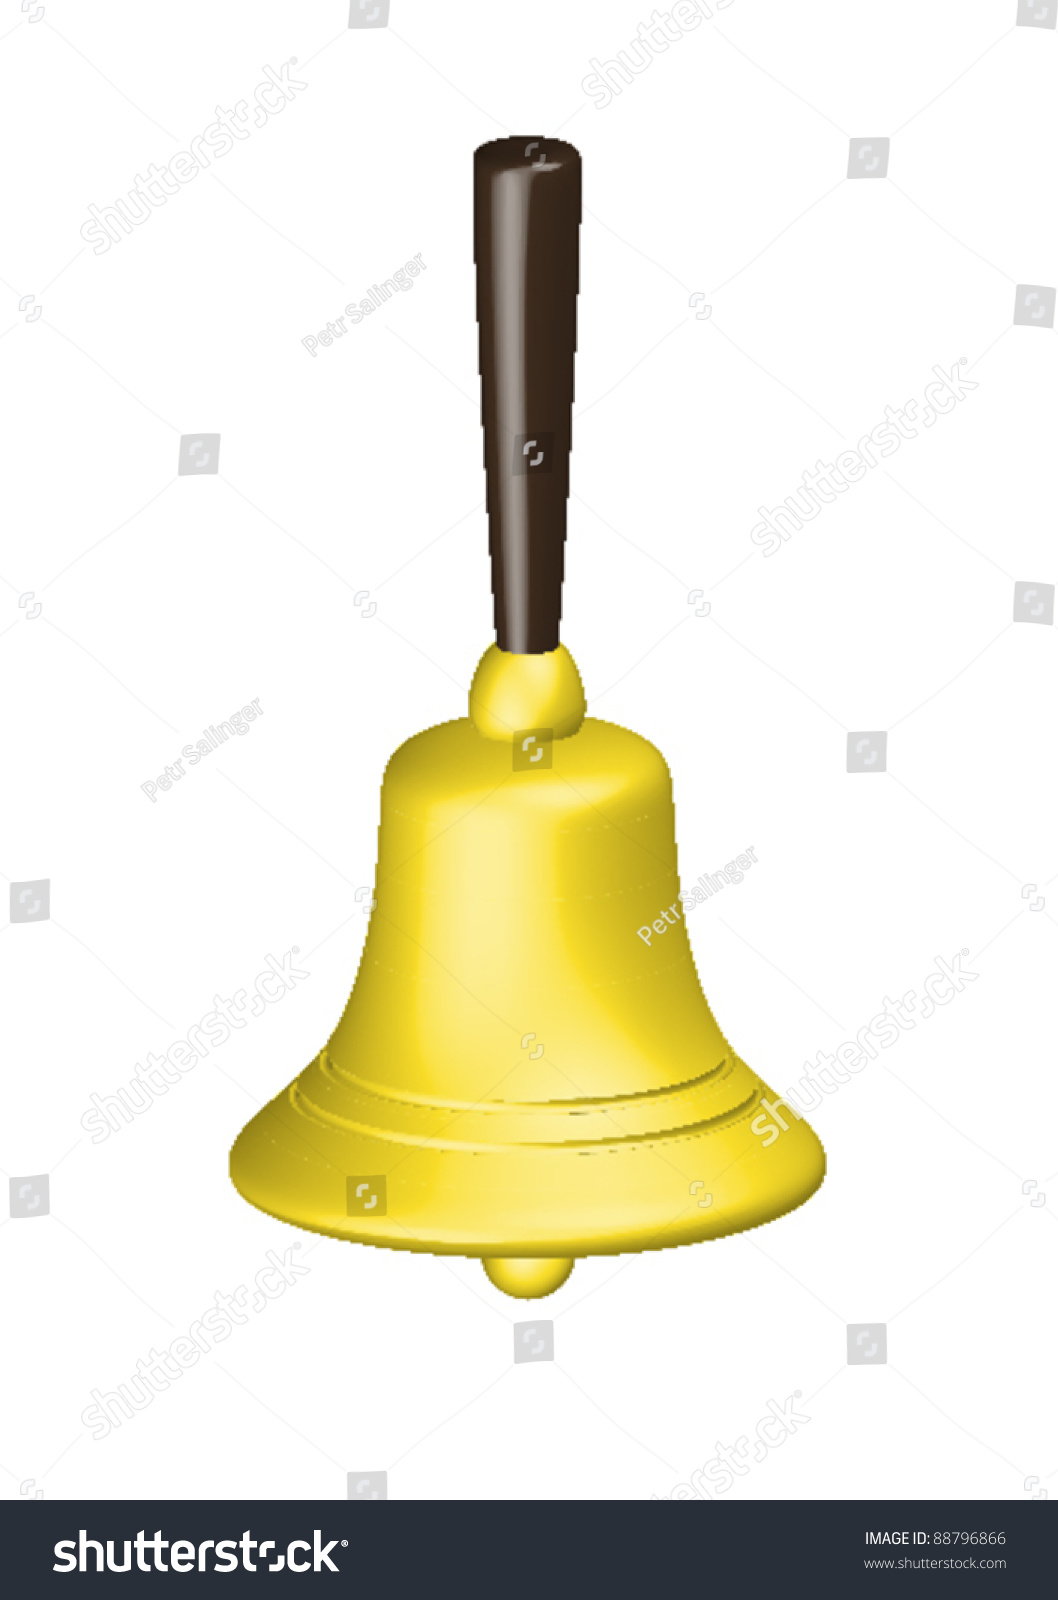 Golden Christmas Handbell Isolated On White Background Stock ...